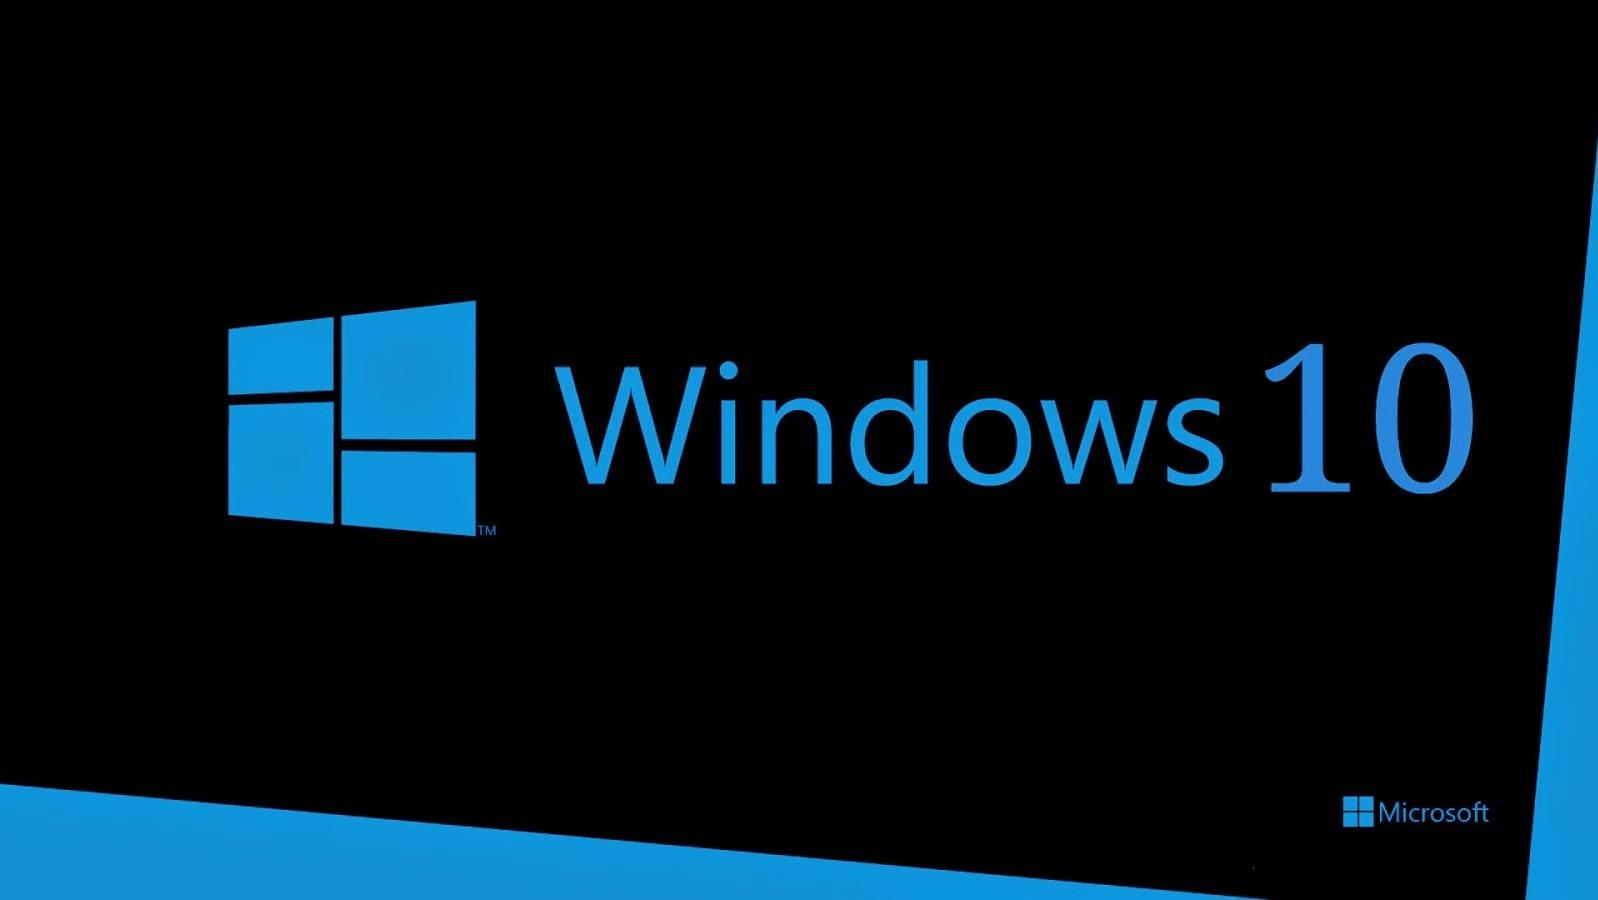 Windows 10 logo wmskillcom 1598x900